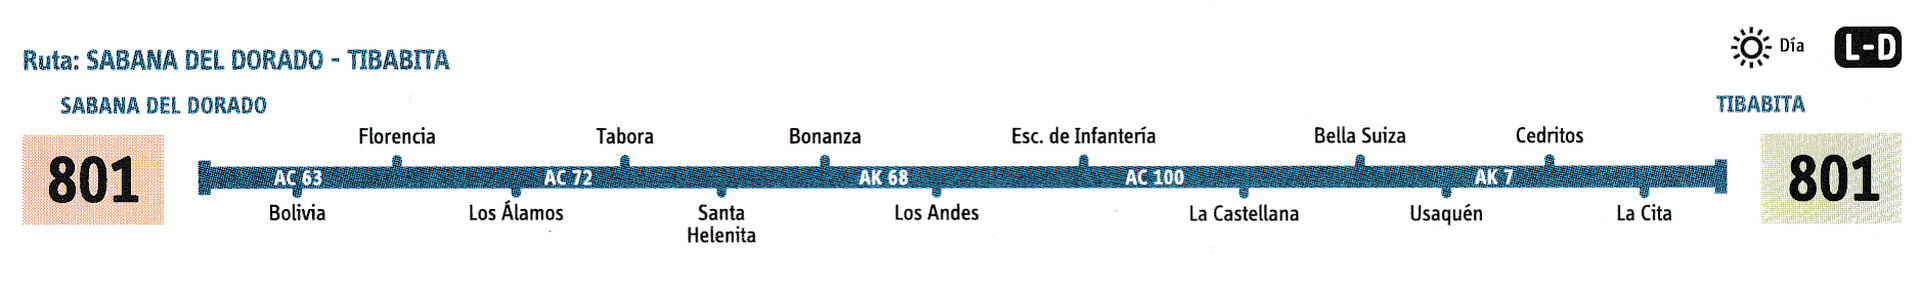 Ruta SITP: 801 Sabana del Dorado ↔ Torca [Urbana] 3